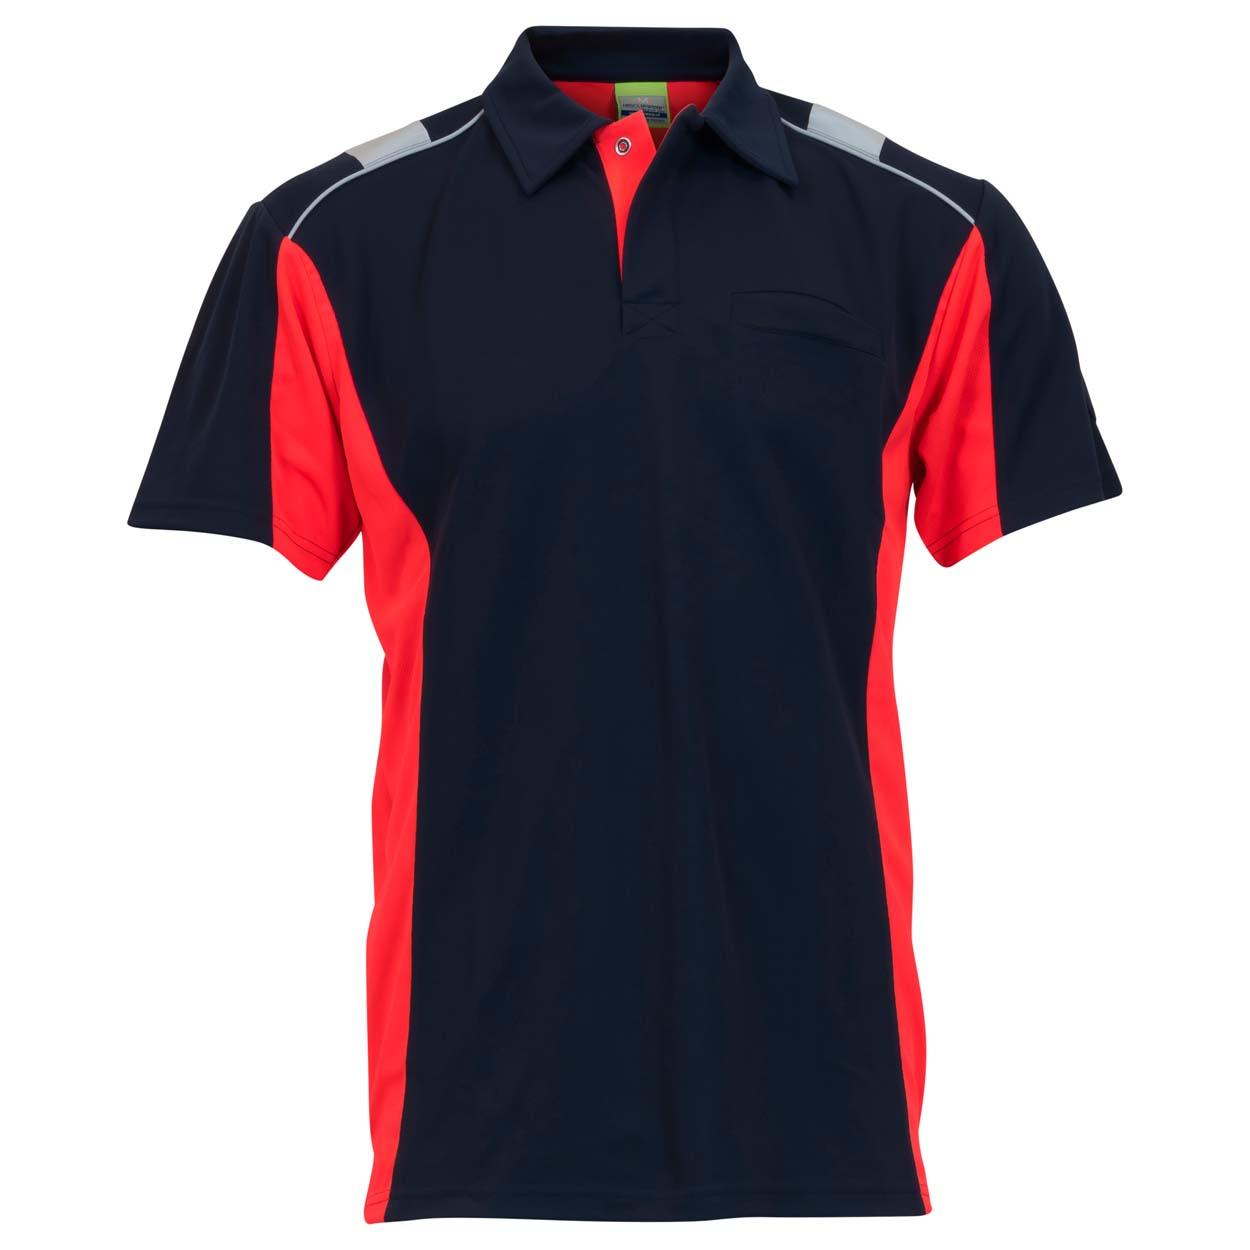 Poloshirt Dynamic Größe in marineblau/neonrot